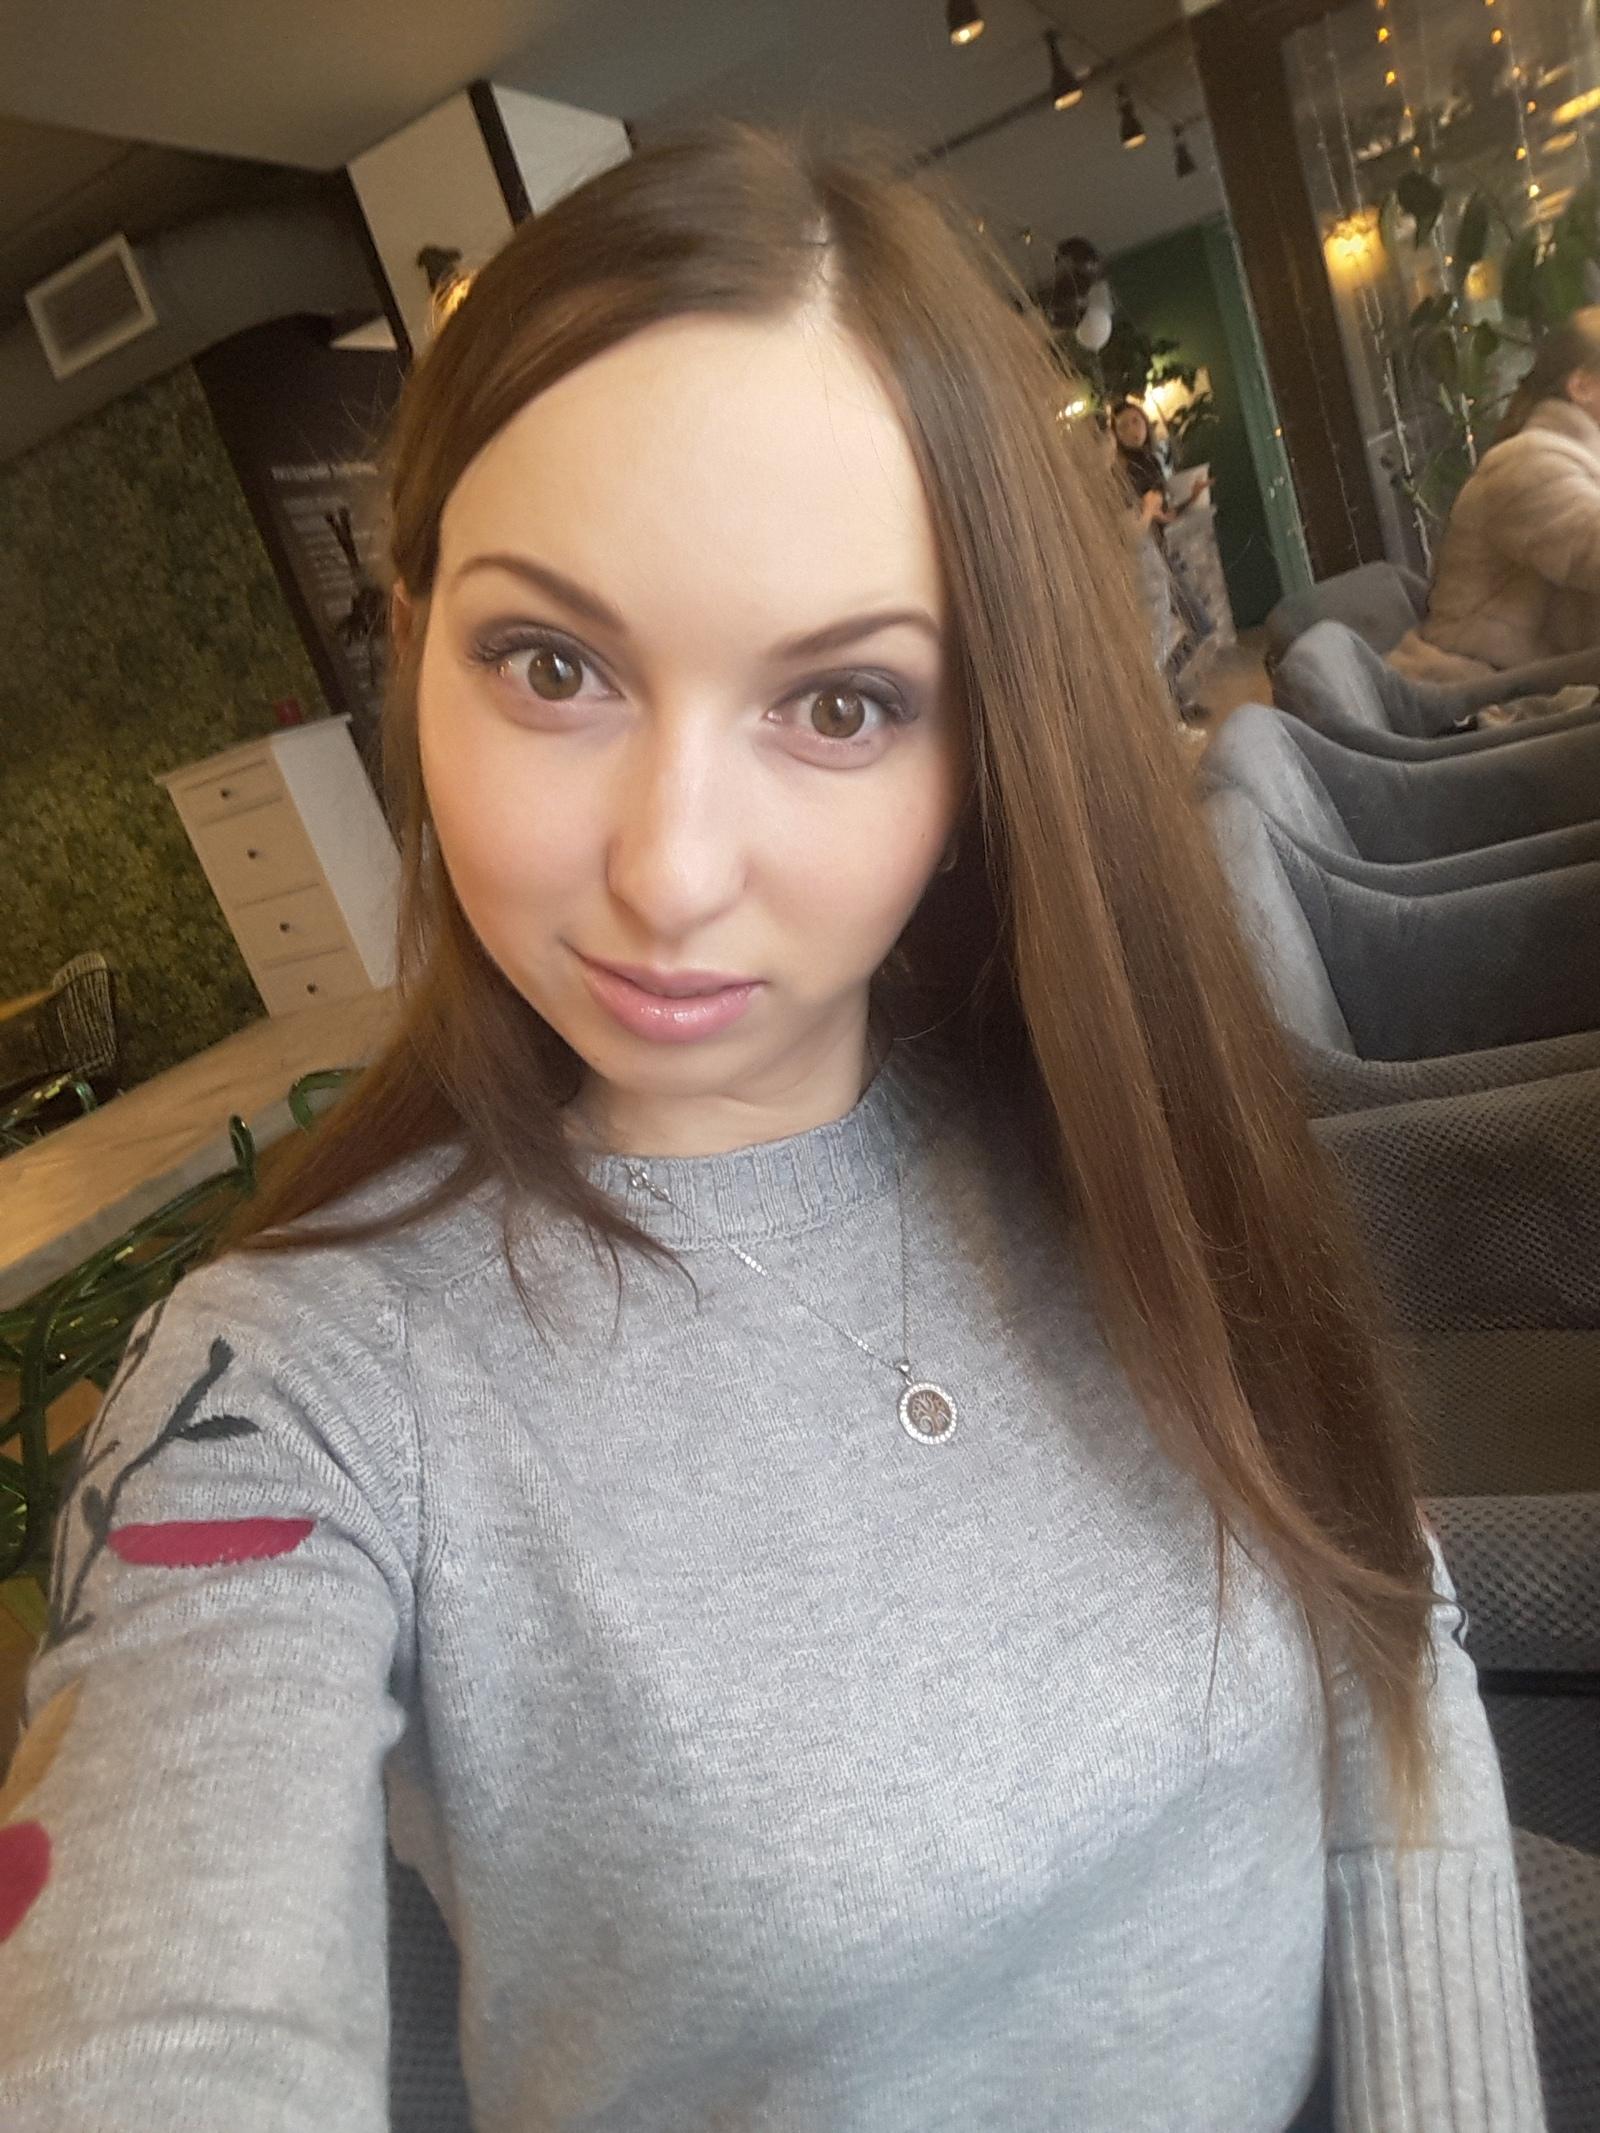 Знакомства без проблем екатеринбург знакомства с иностранцами в москве без регистрации